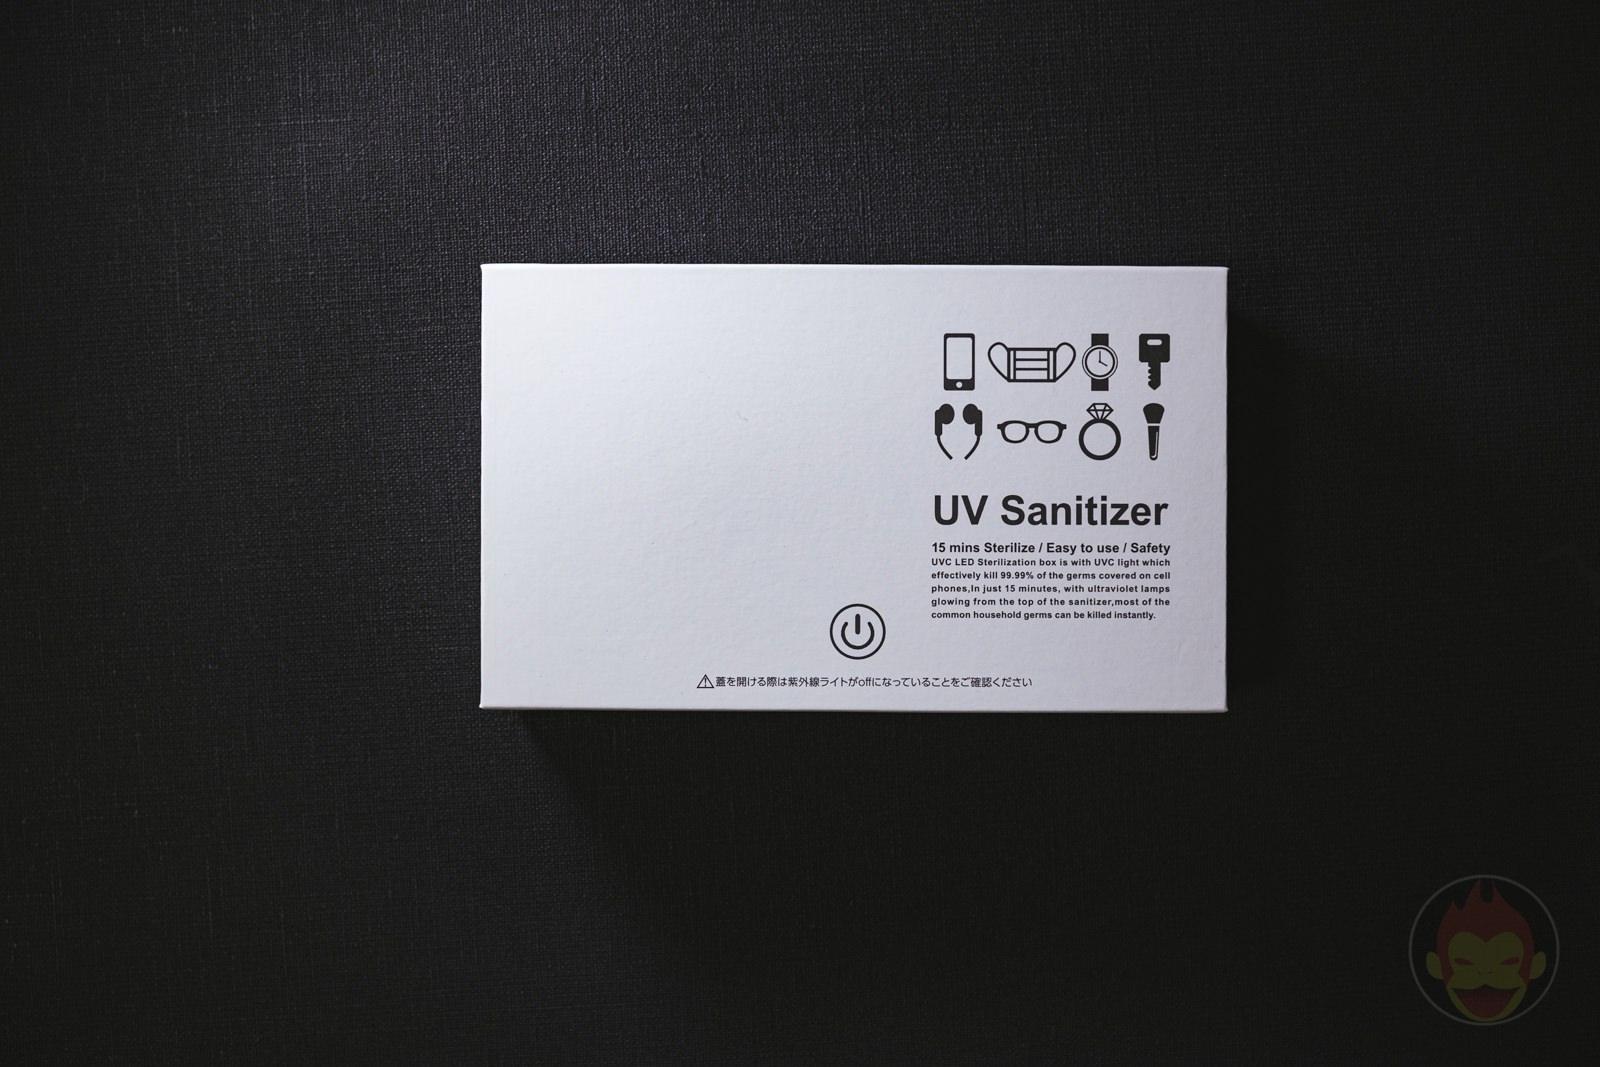 Papermade-UV-Sanitizer-Box-01.jpg